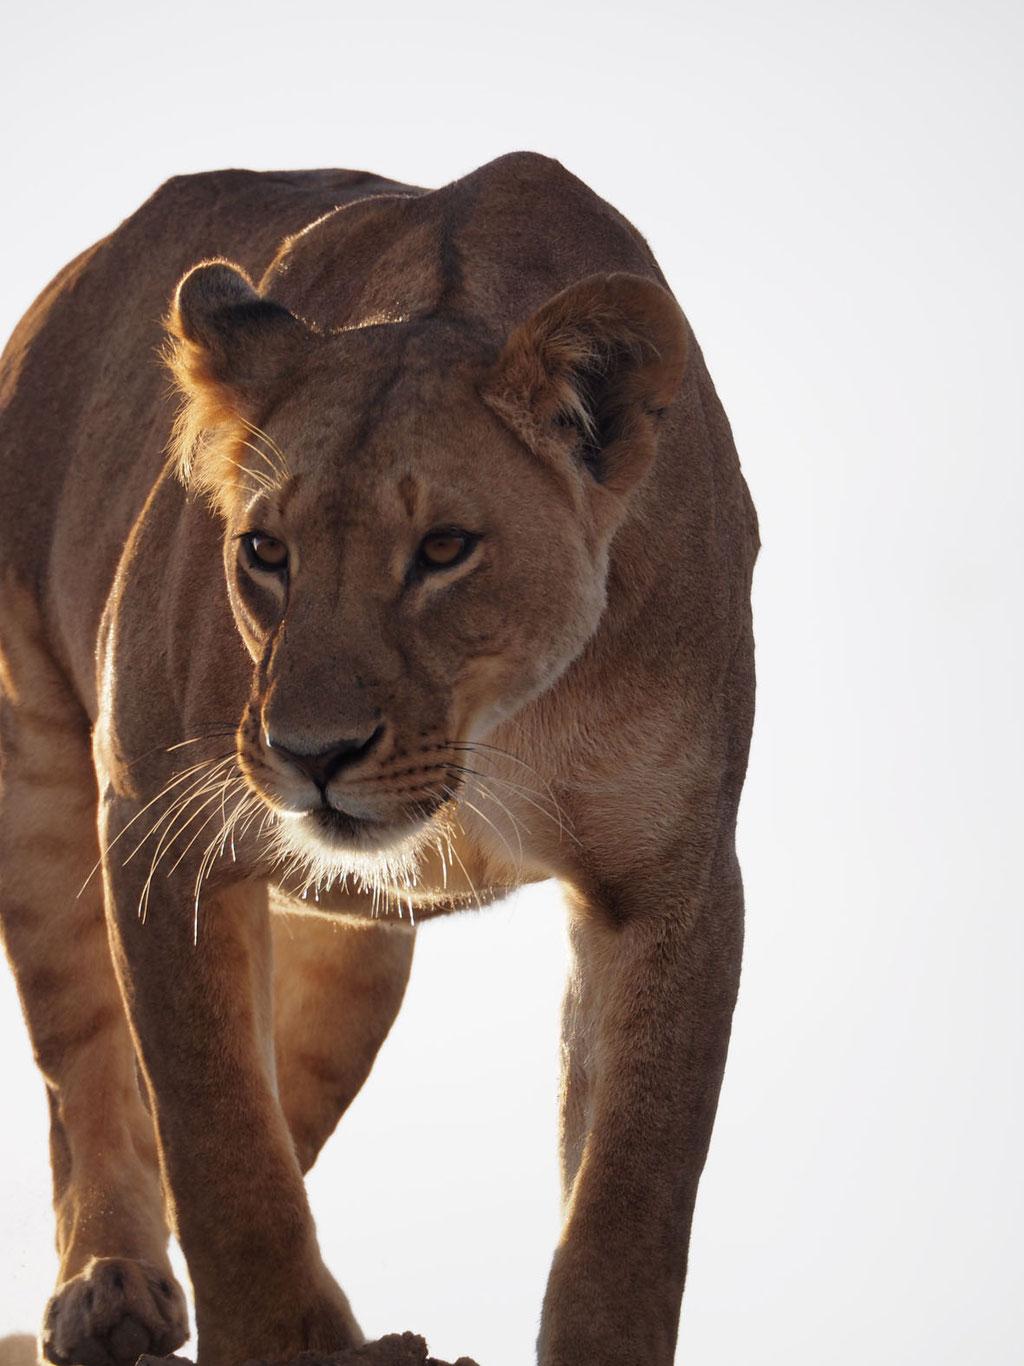 Kenia, Laikipia Plateau: Löwin